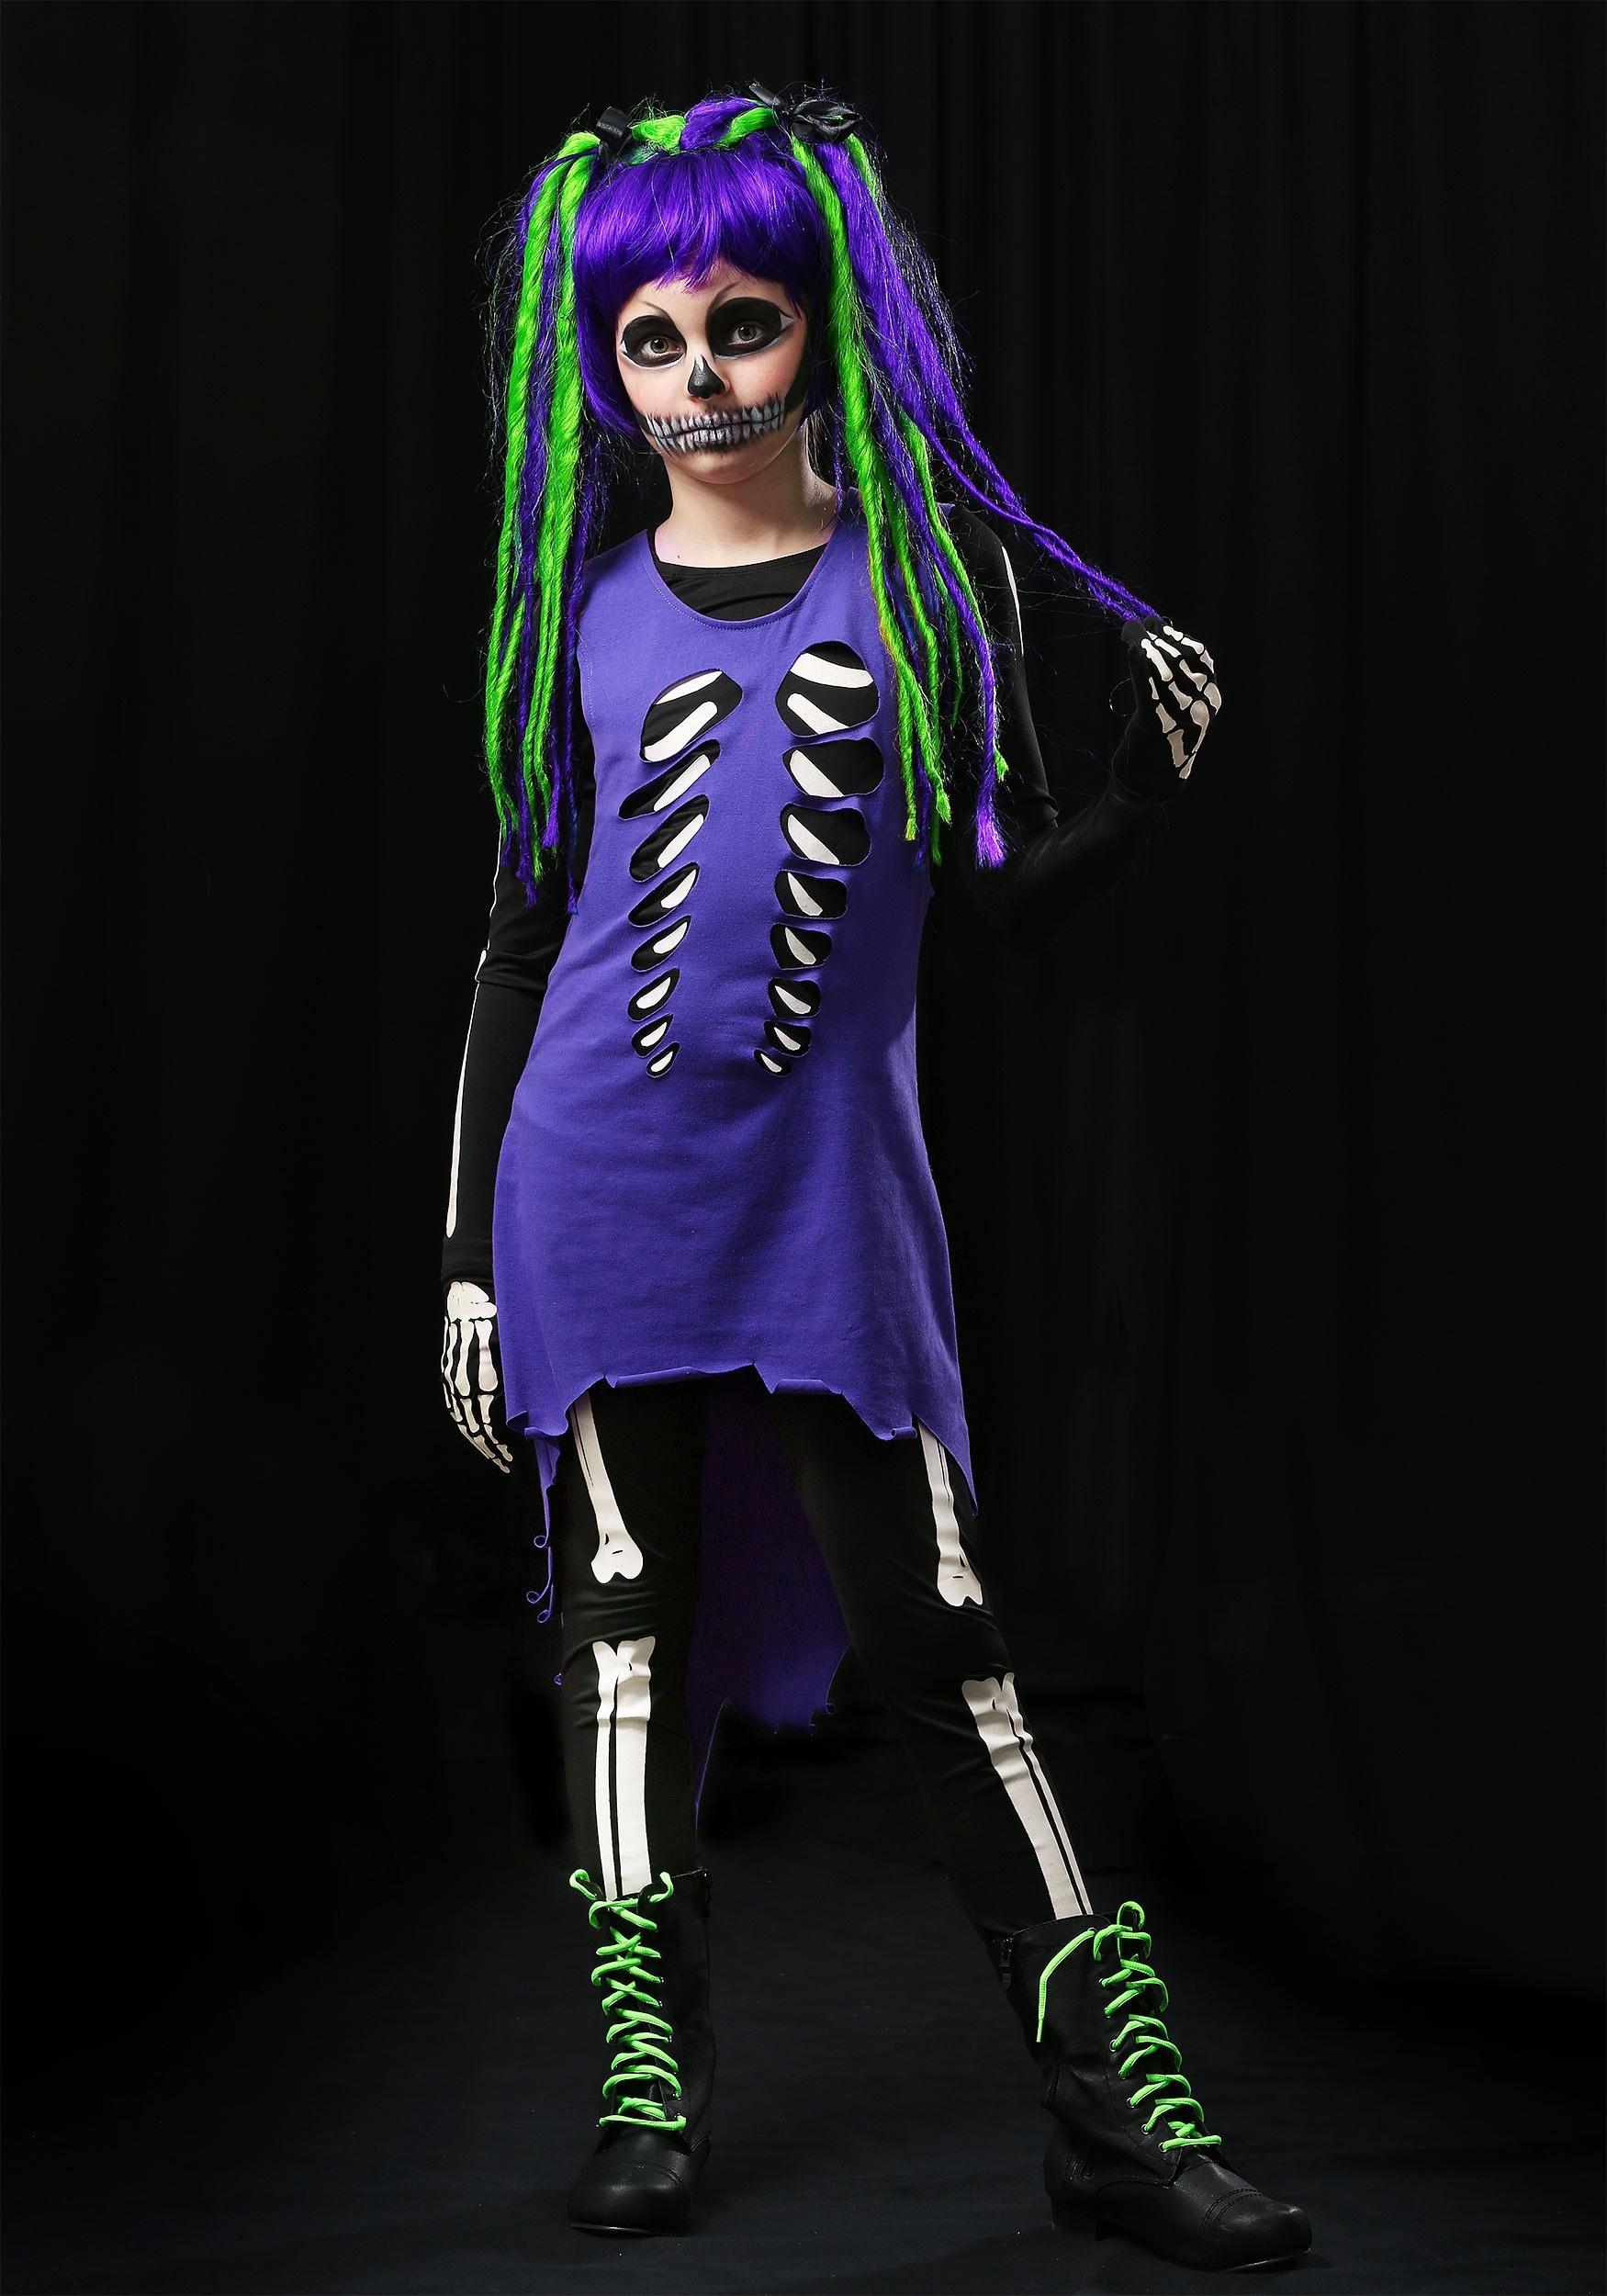 Halloween costume teen skeleton dildo fucking machine - 3 3